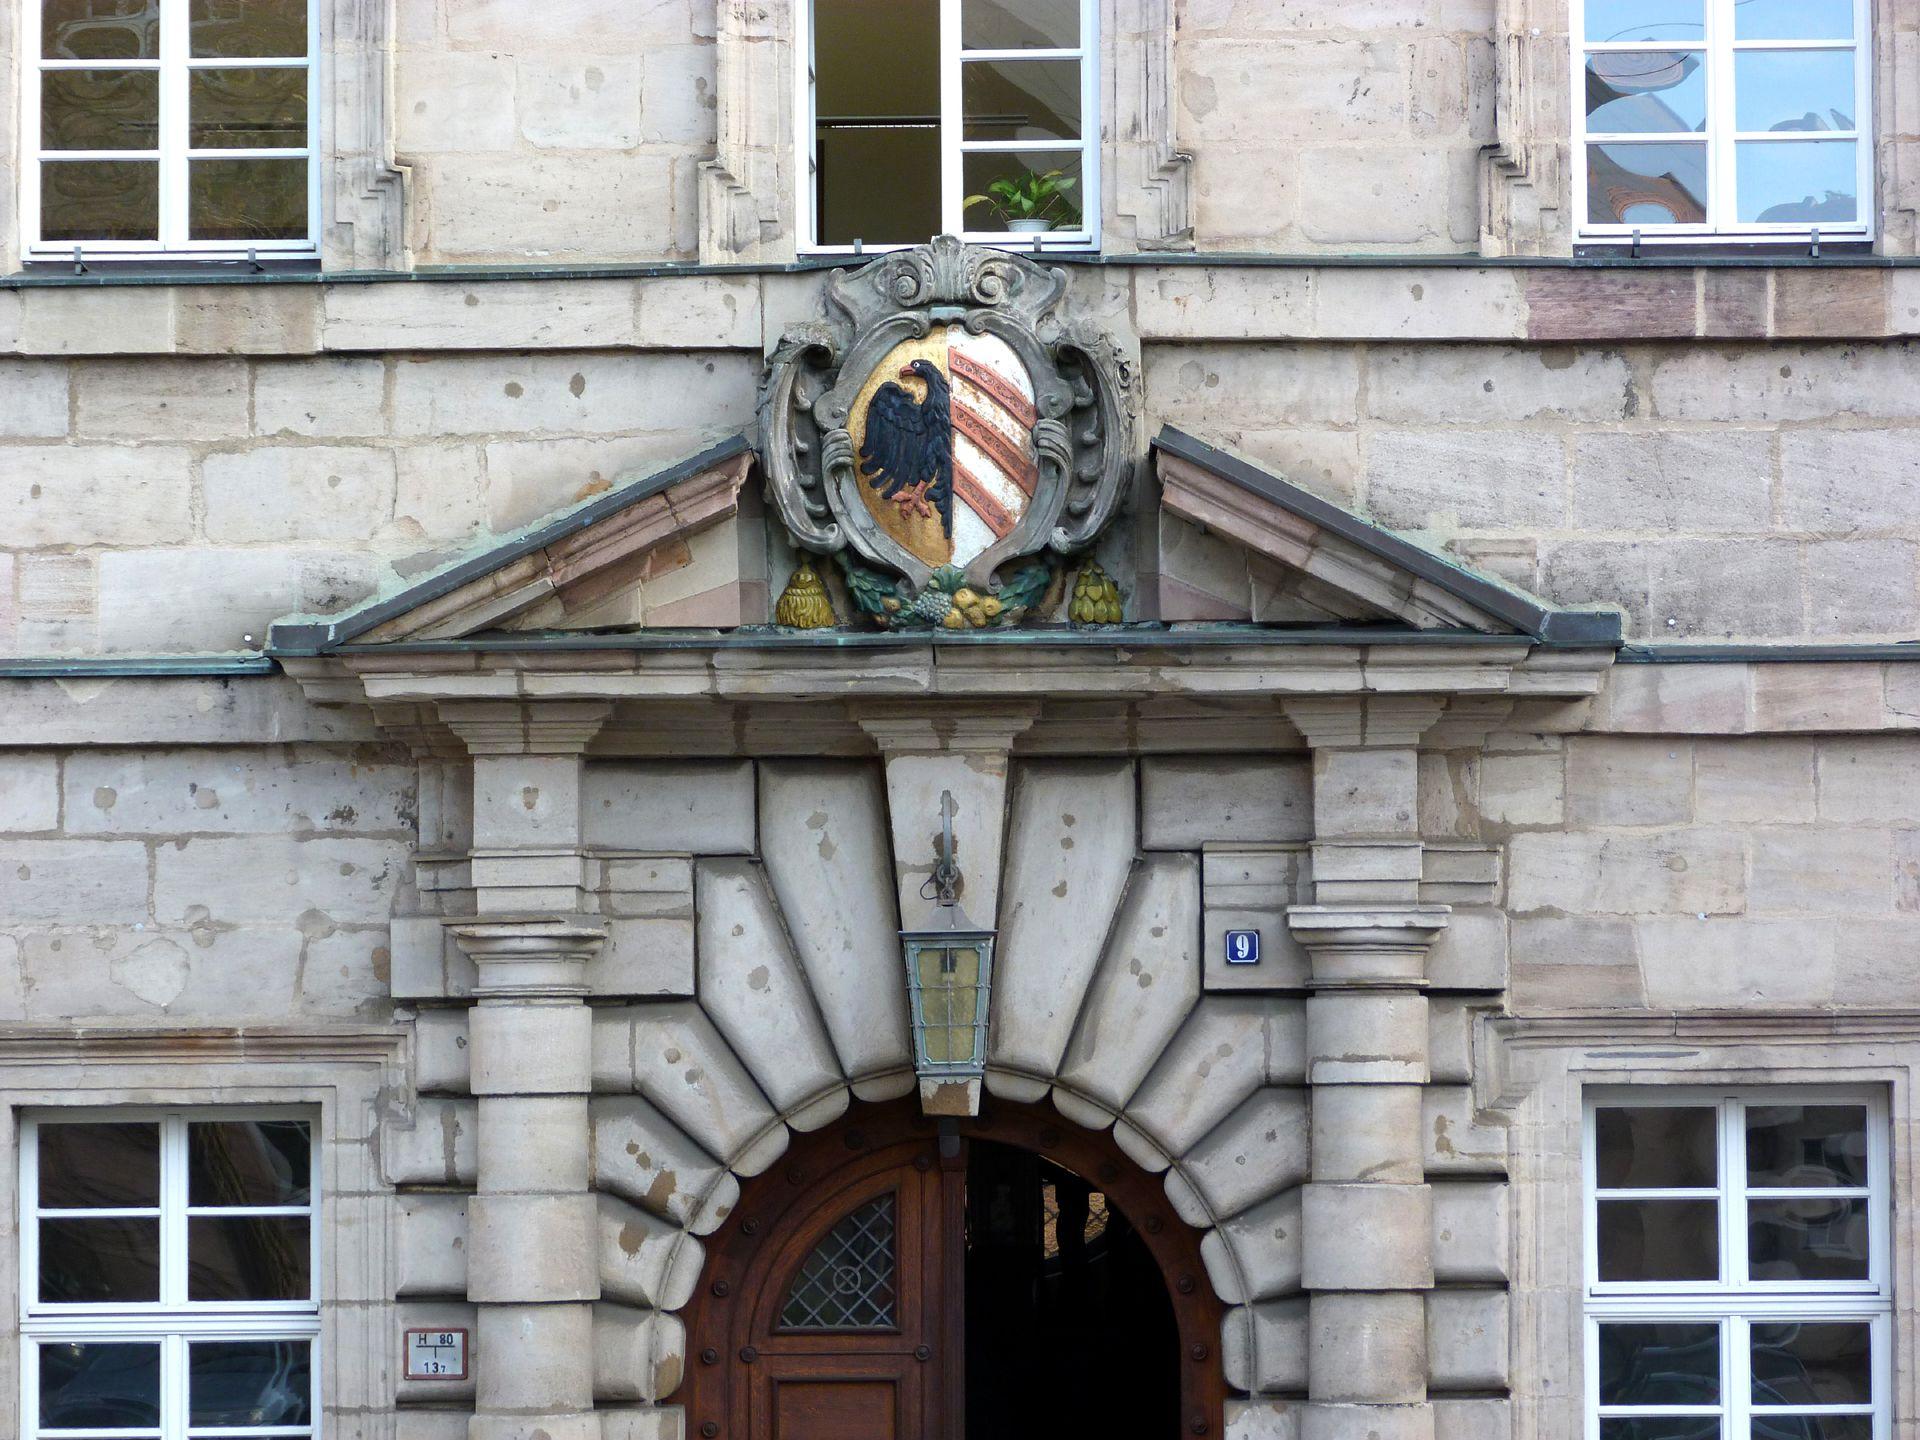 Baumeisterhaus Portal: gesprengter Giebel mit Wappenkartusche